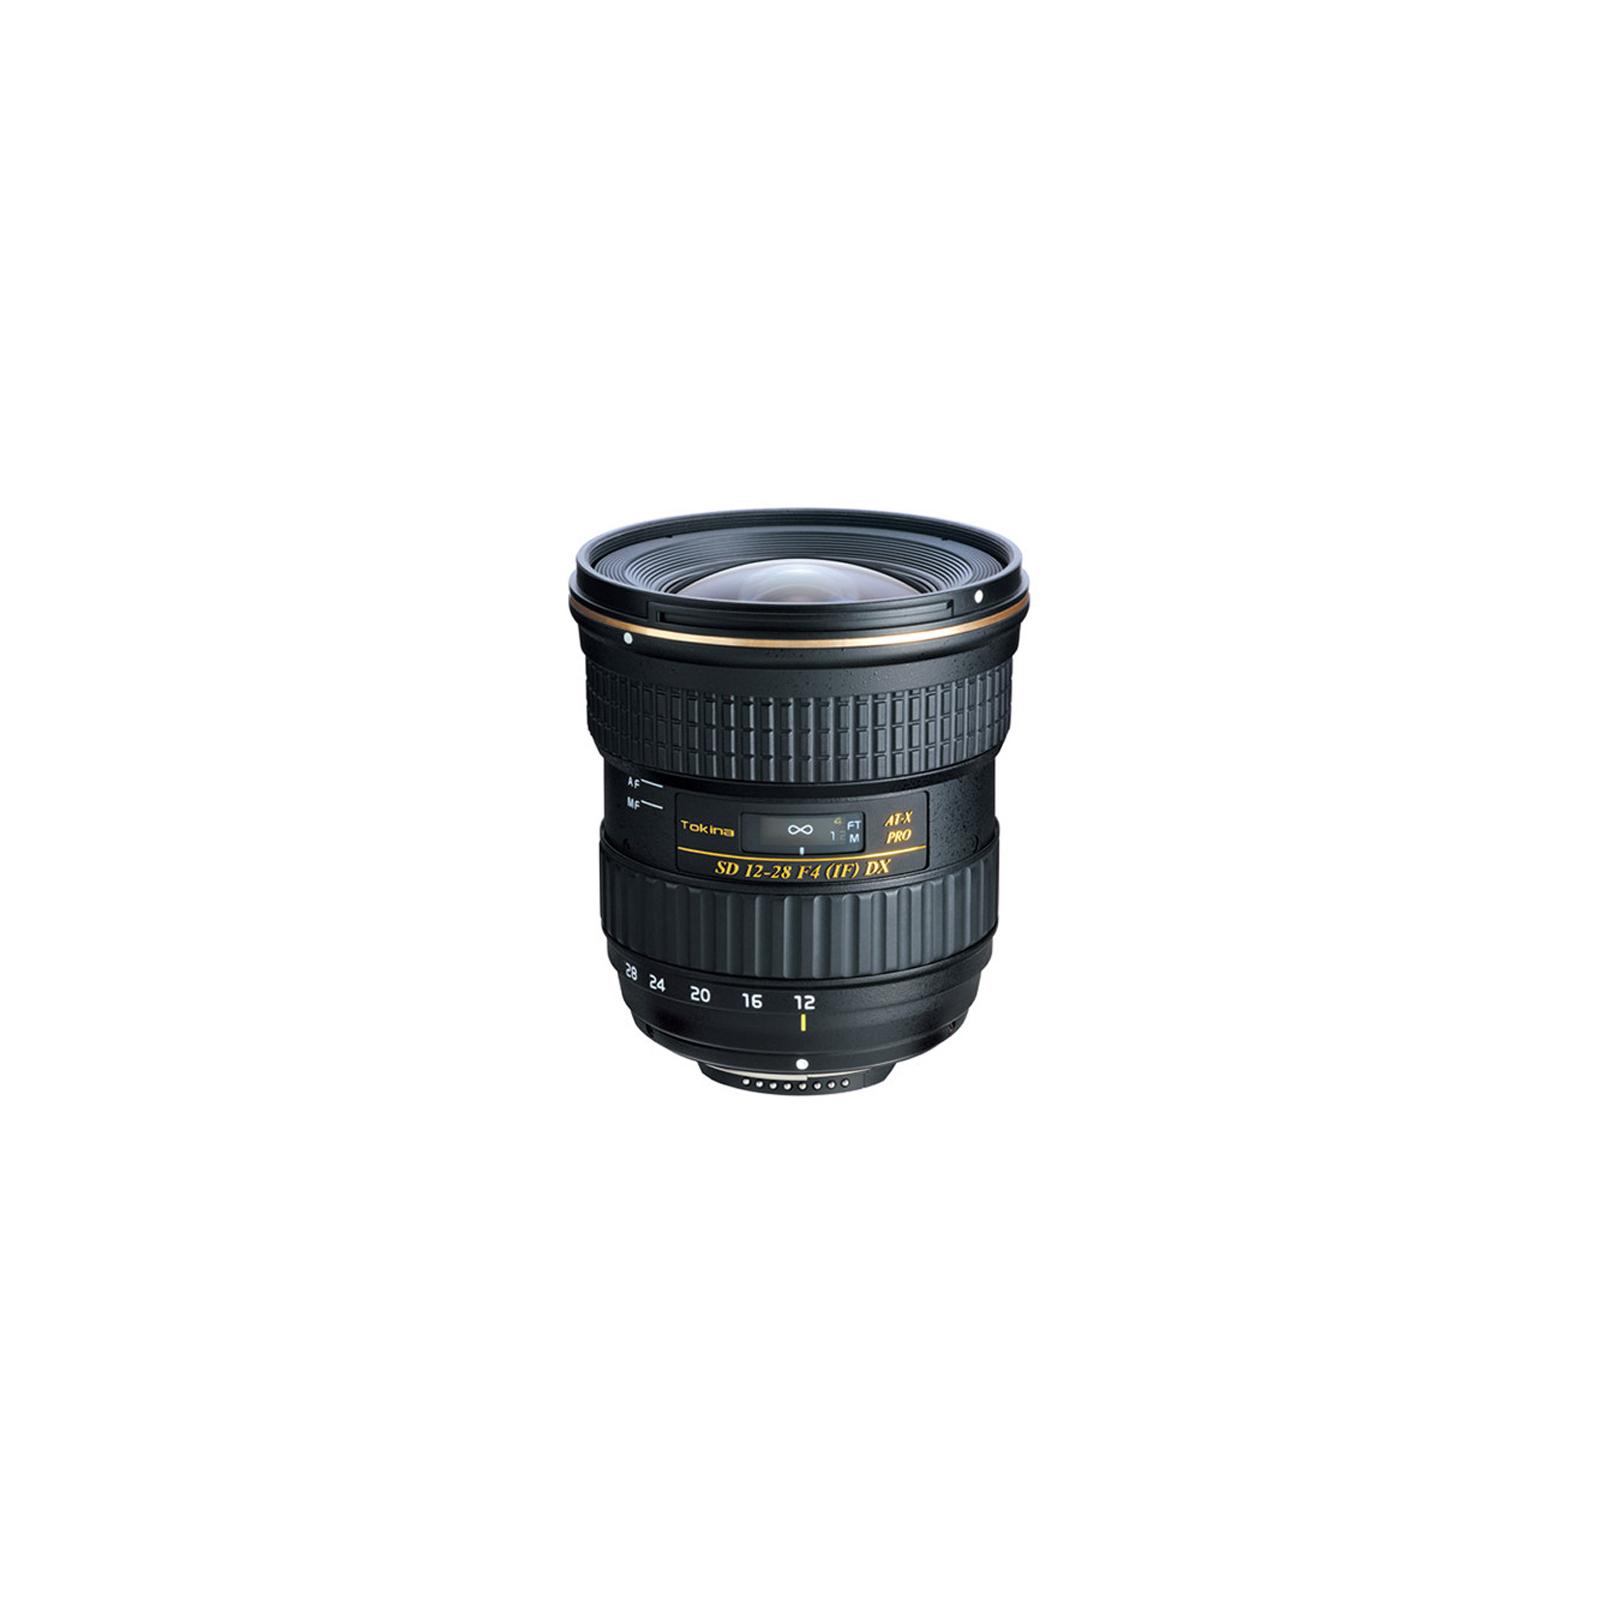 Объектив Tokina AT-X PRO DX 12-28mm f/4.0 (Canon) (ATXAF128DXC)